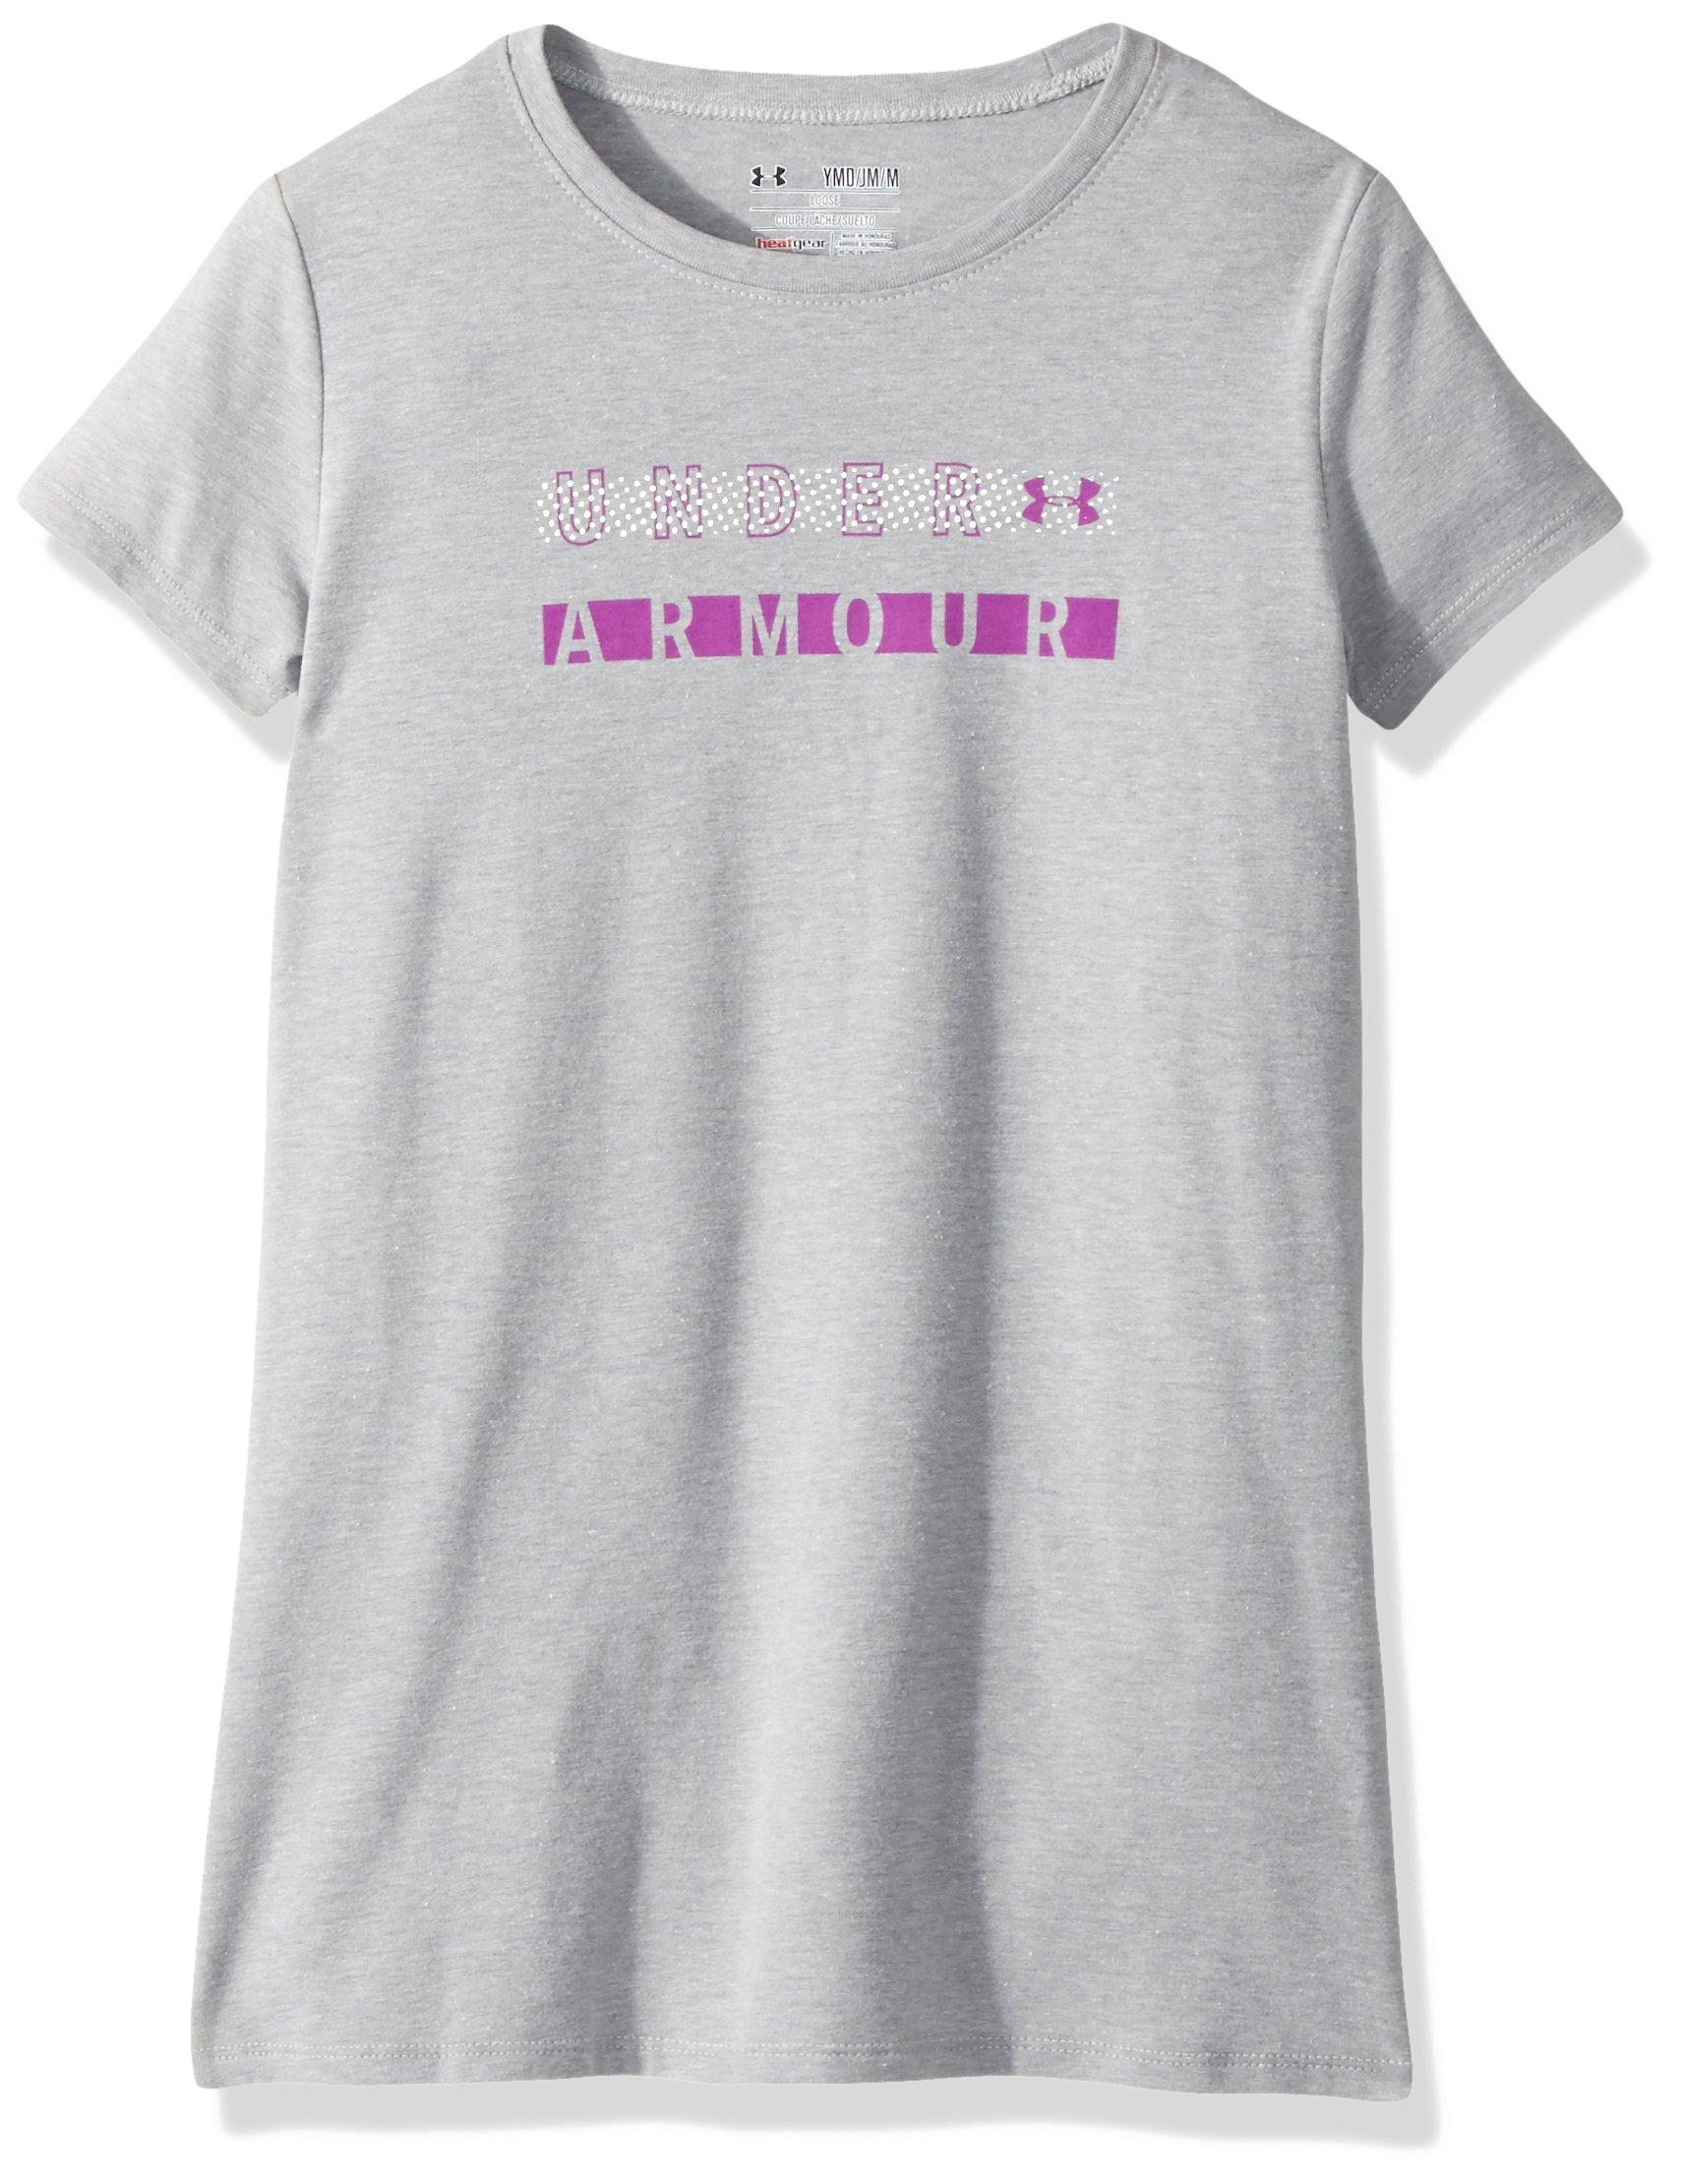 Under Armour Girls Dot Wordmark Short Sleeve Athletic Shirt, Steel Light Heather (035)/Purple Rave, Youth Large